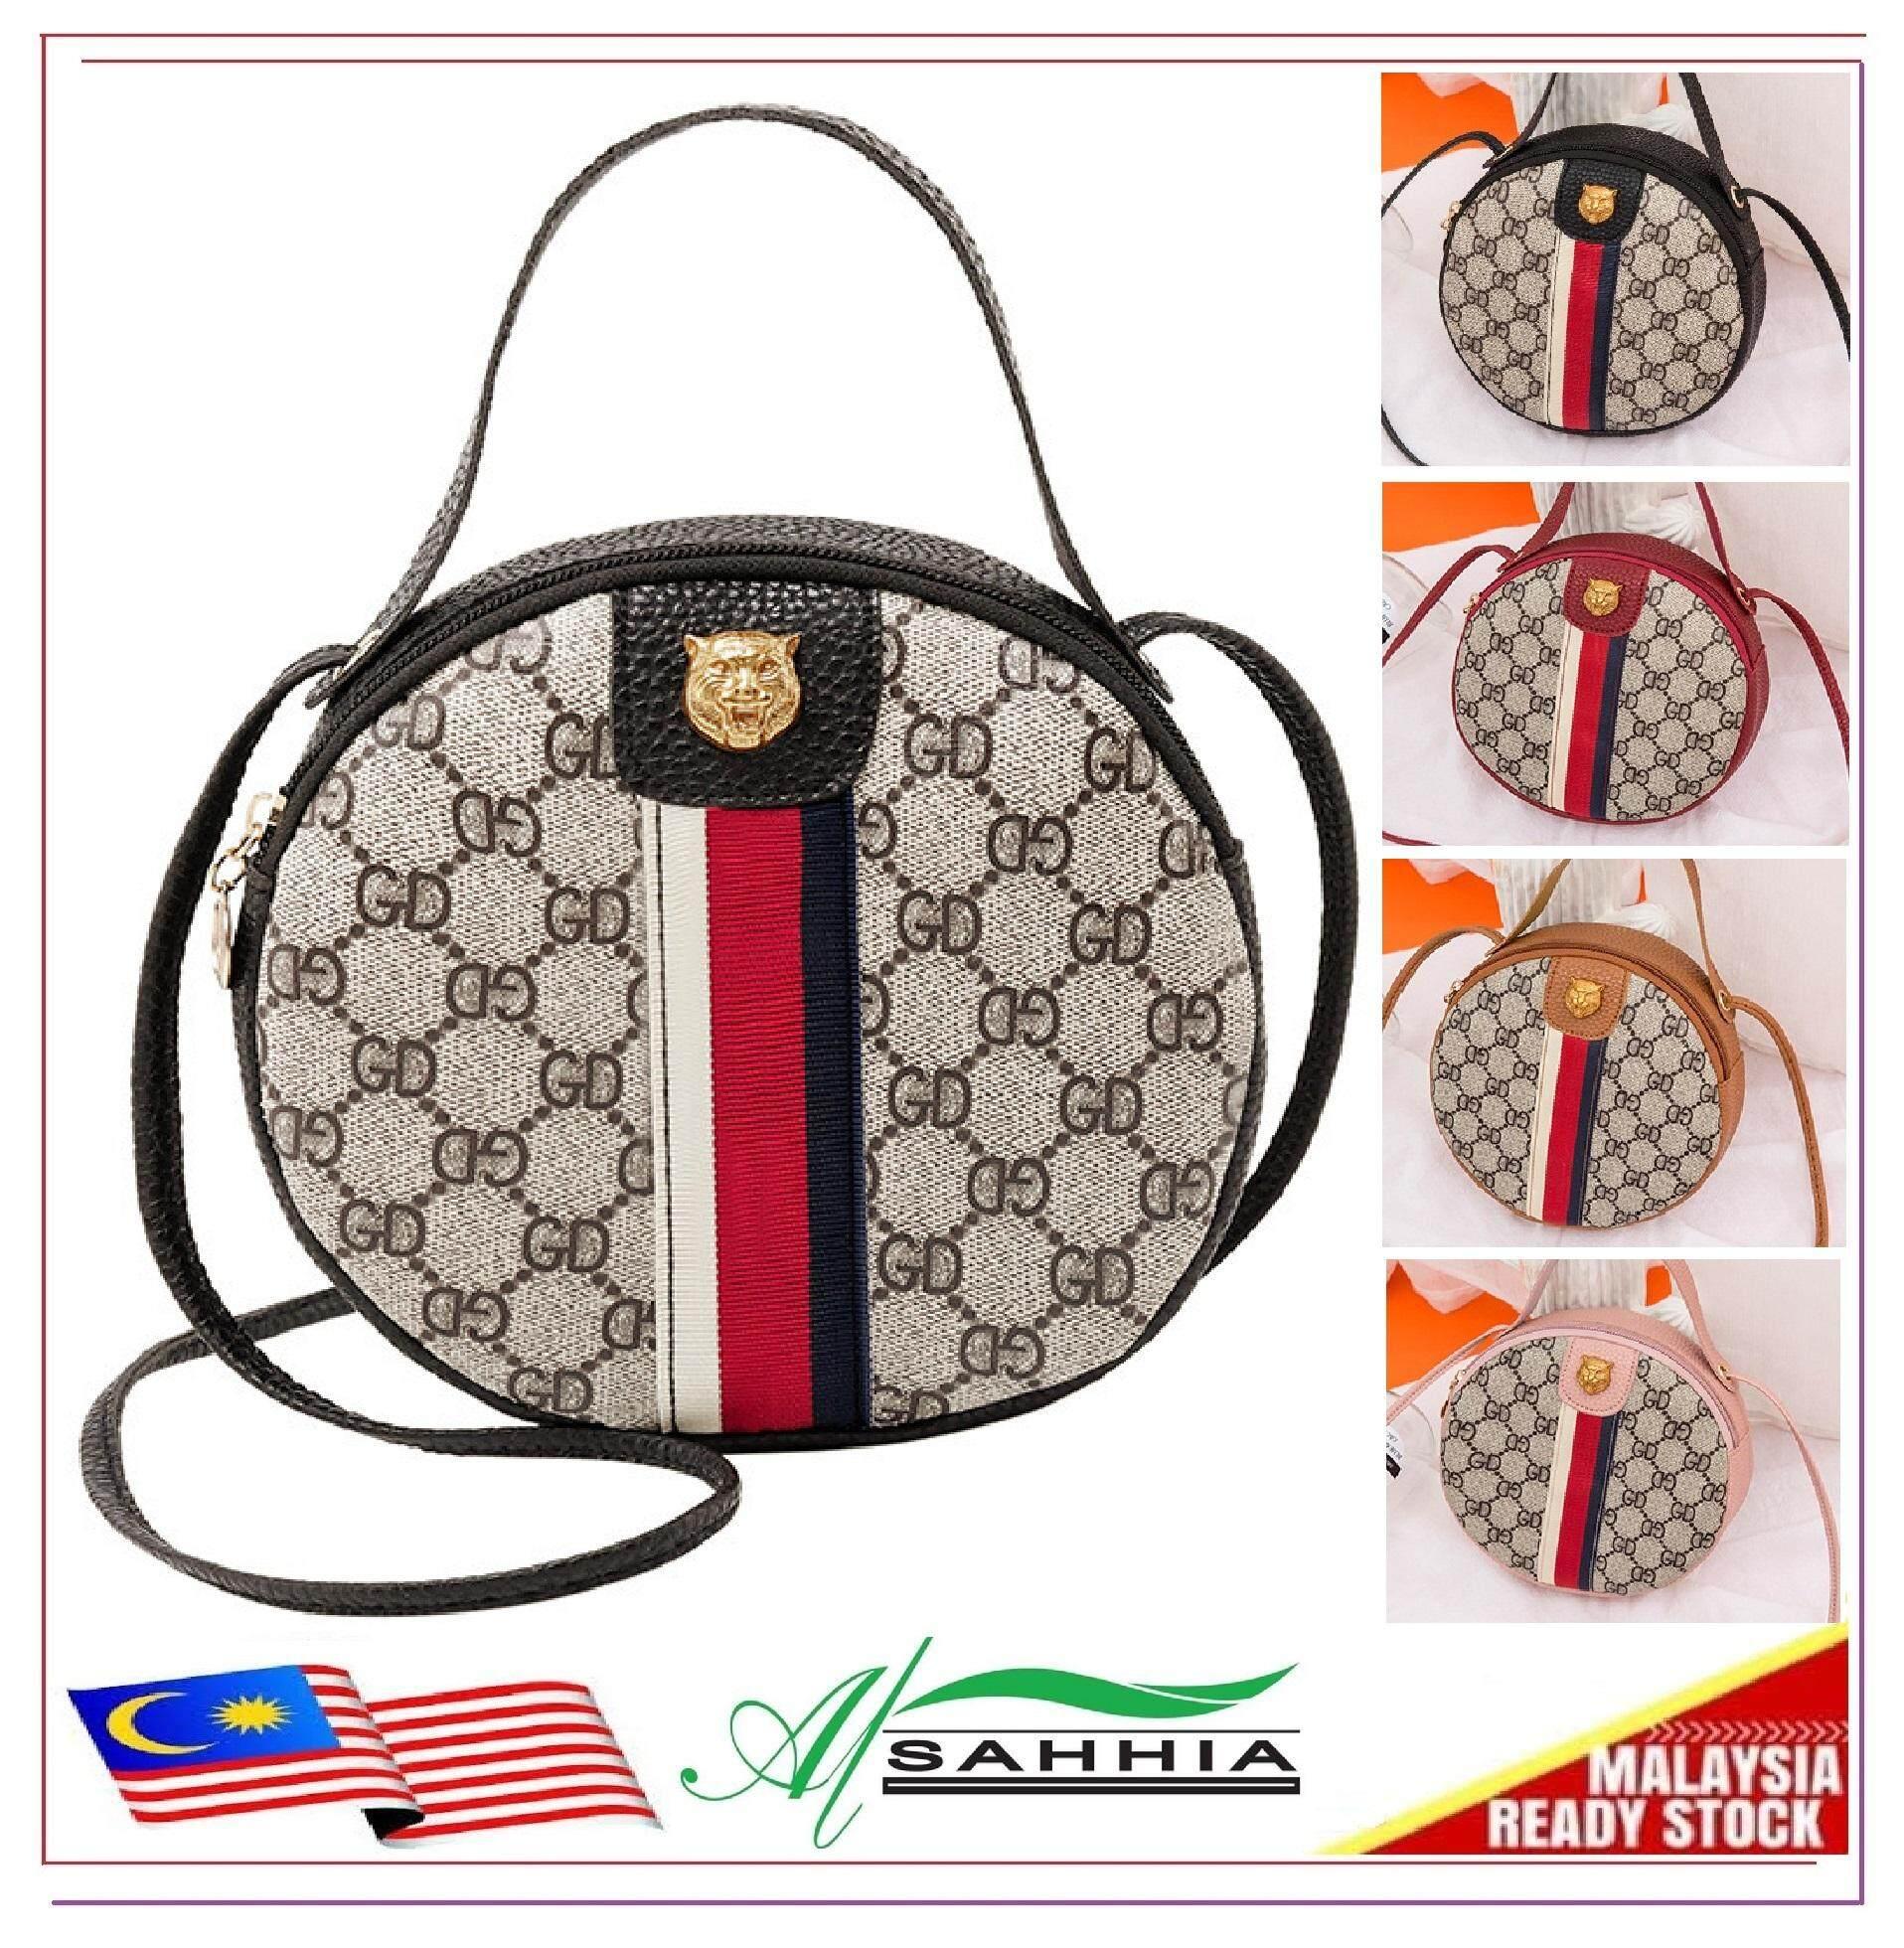 Al Sahhia Ready Stock Tiger GD 3 Line Round Sling Bag Handbag